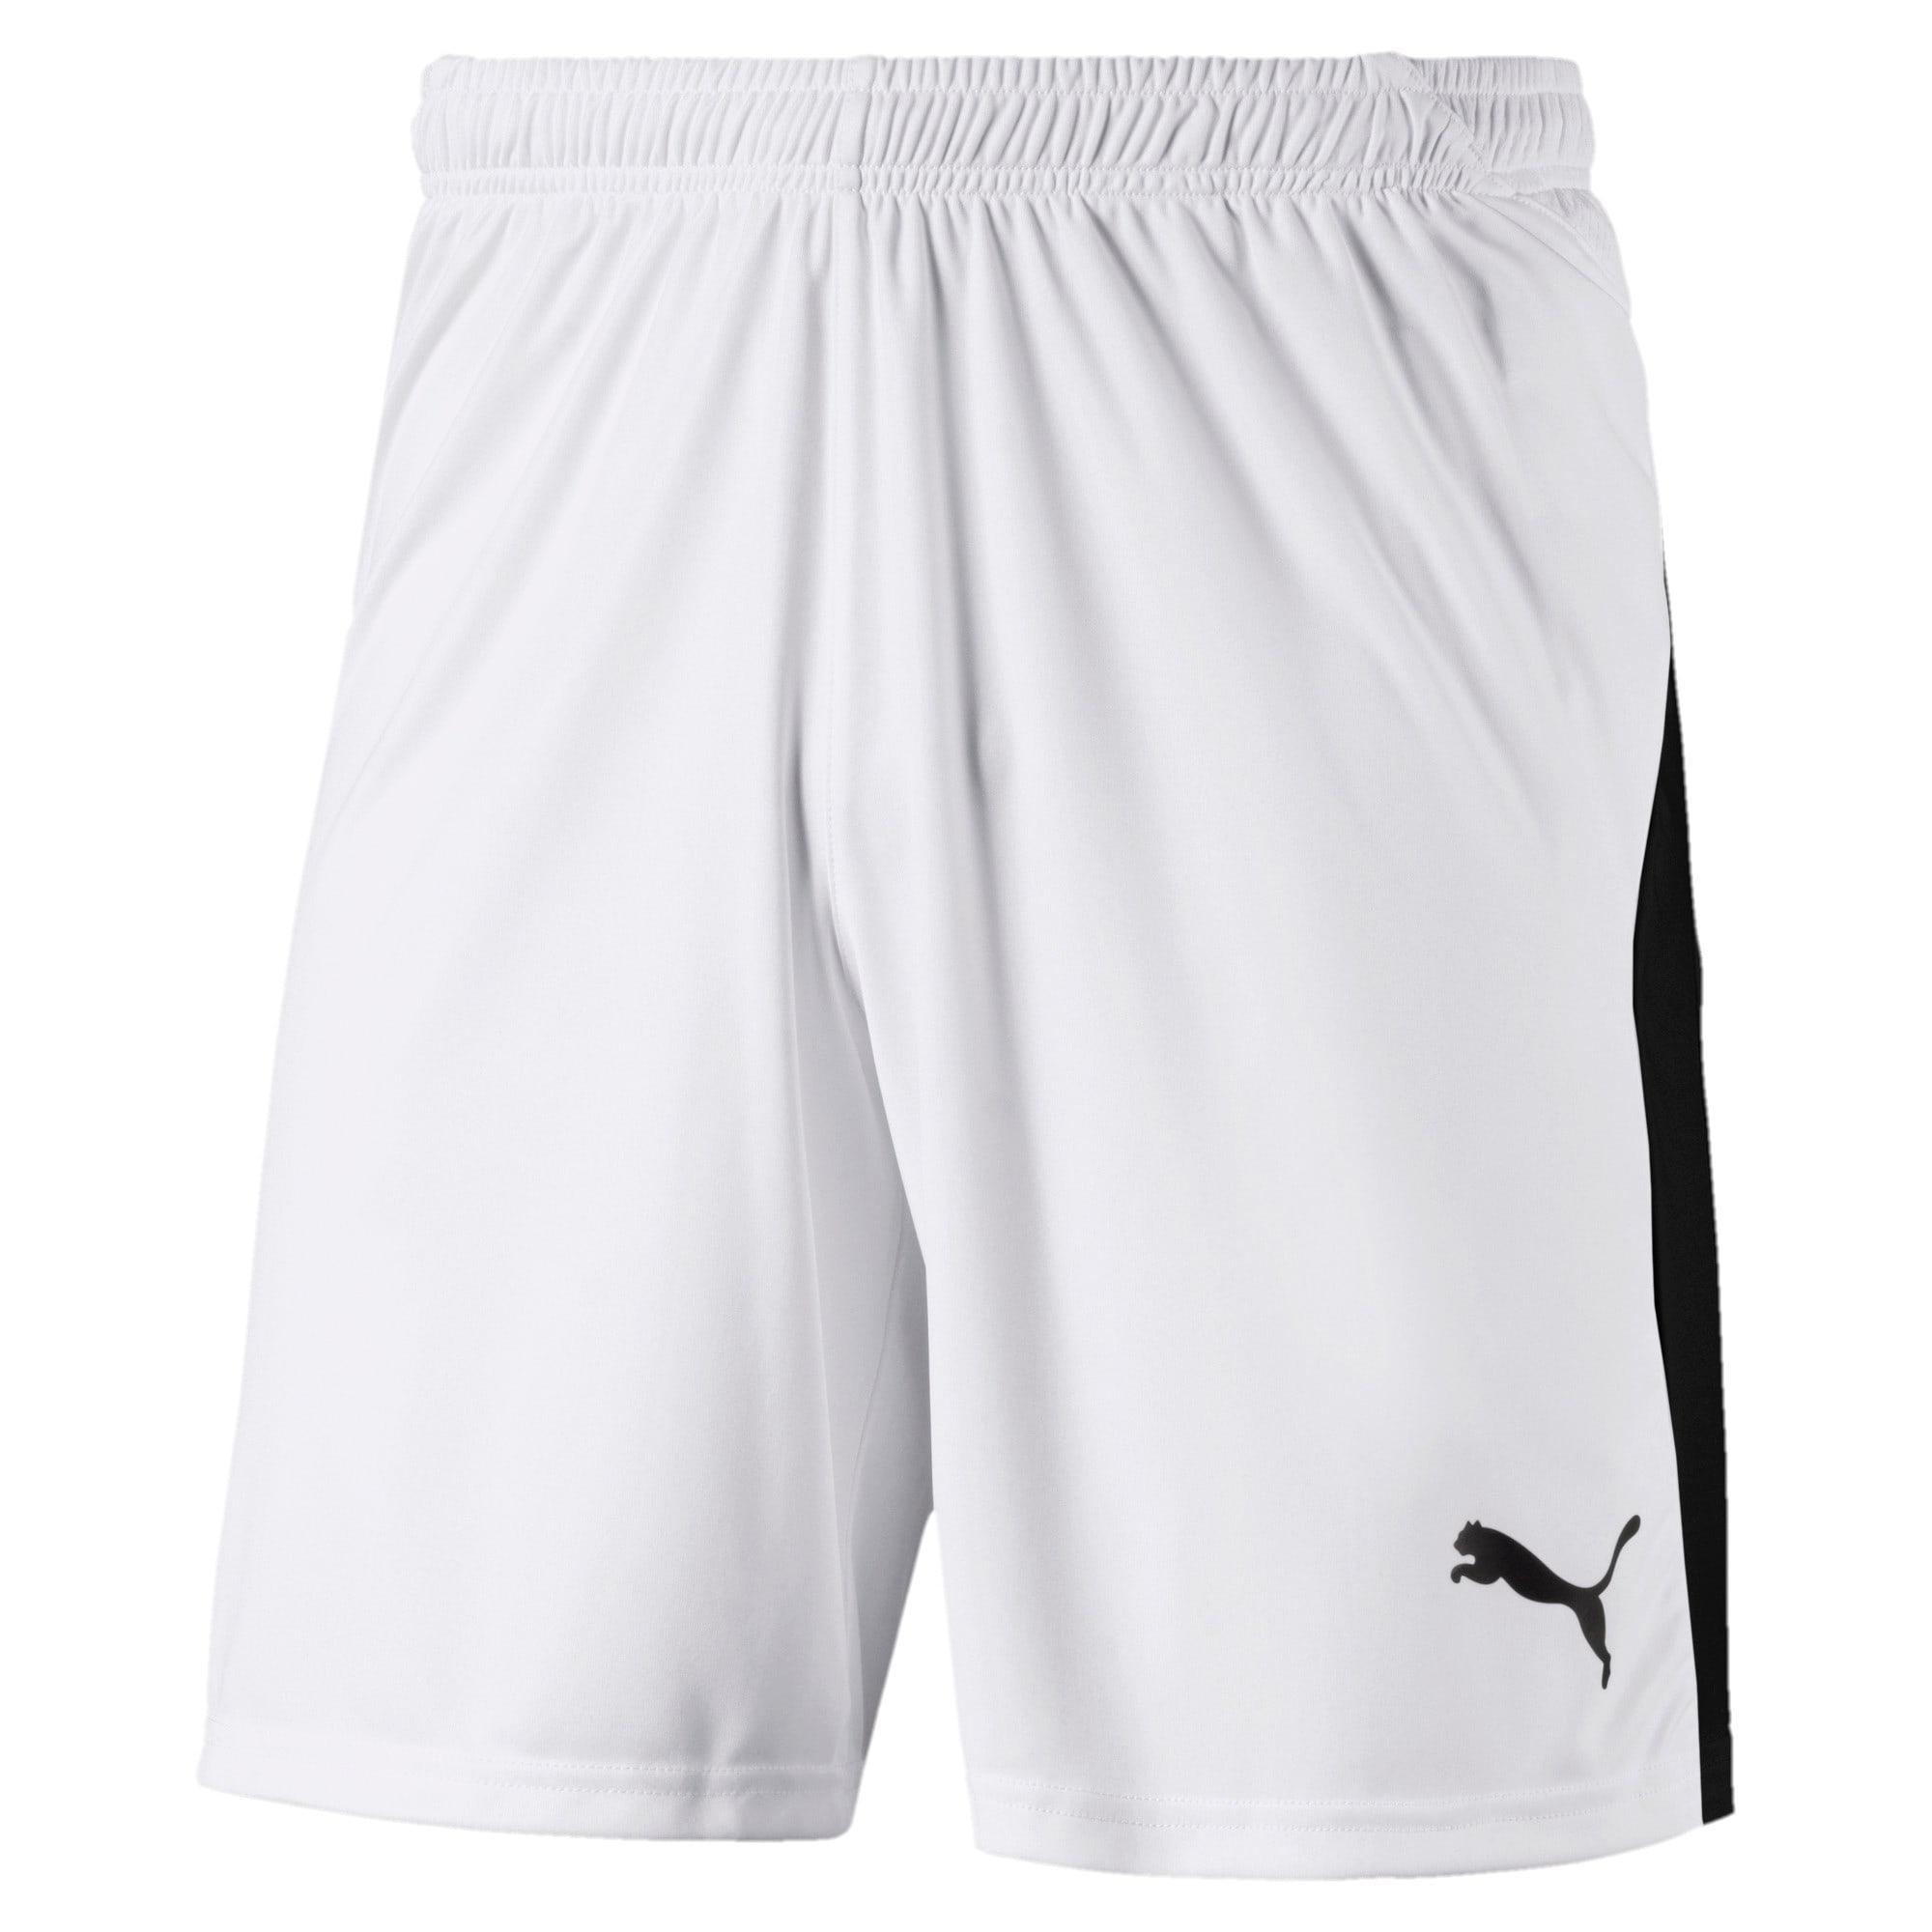 Thumbnail 1 of Liga Men's Shorts, Puma White-Puma Black, medium